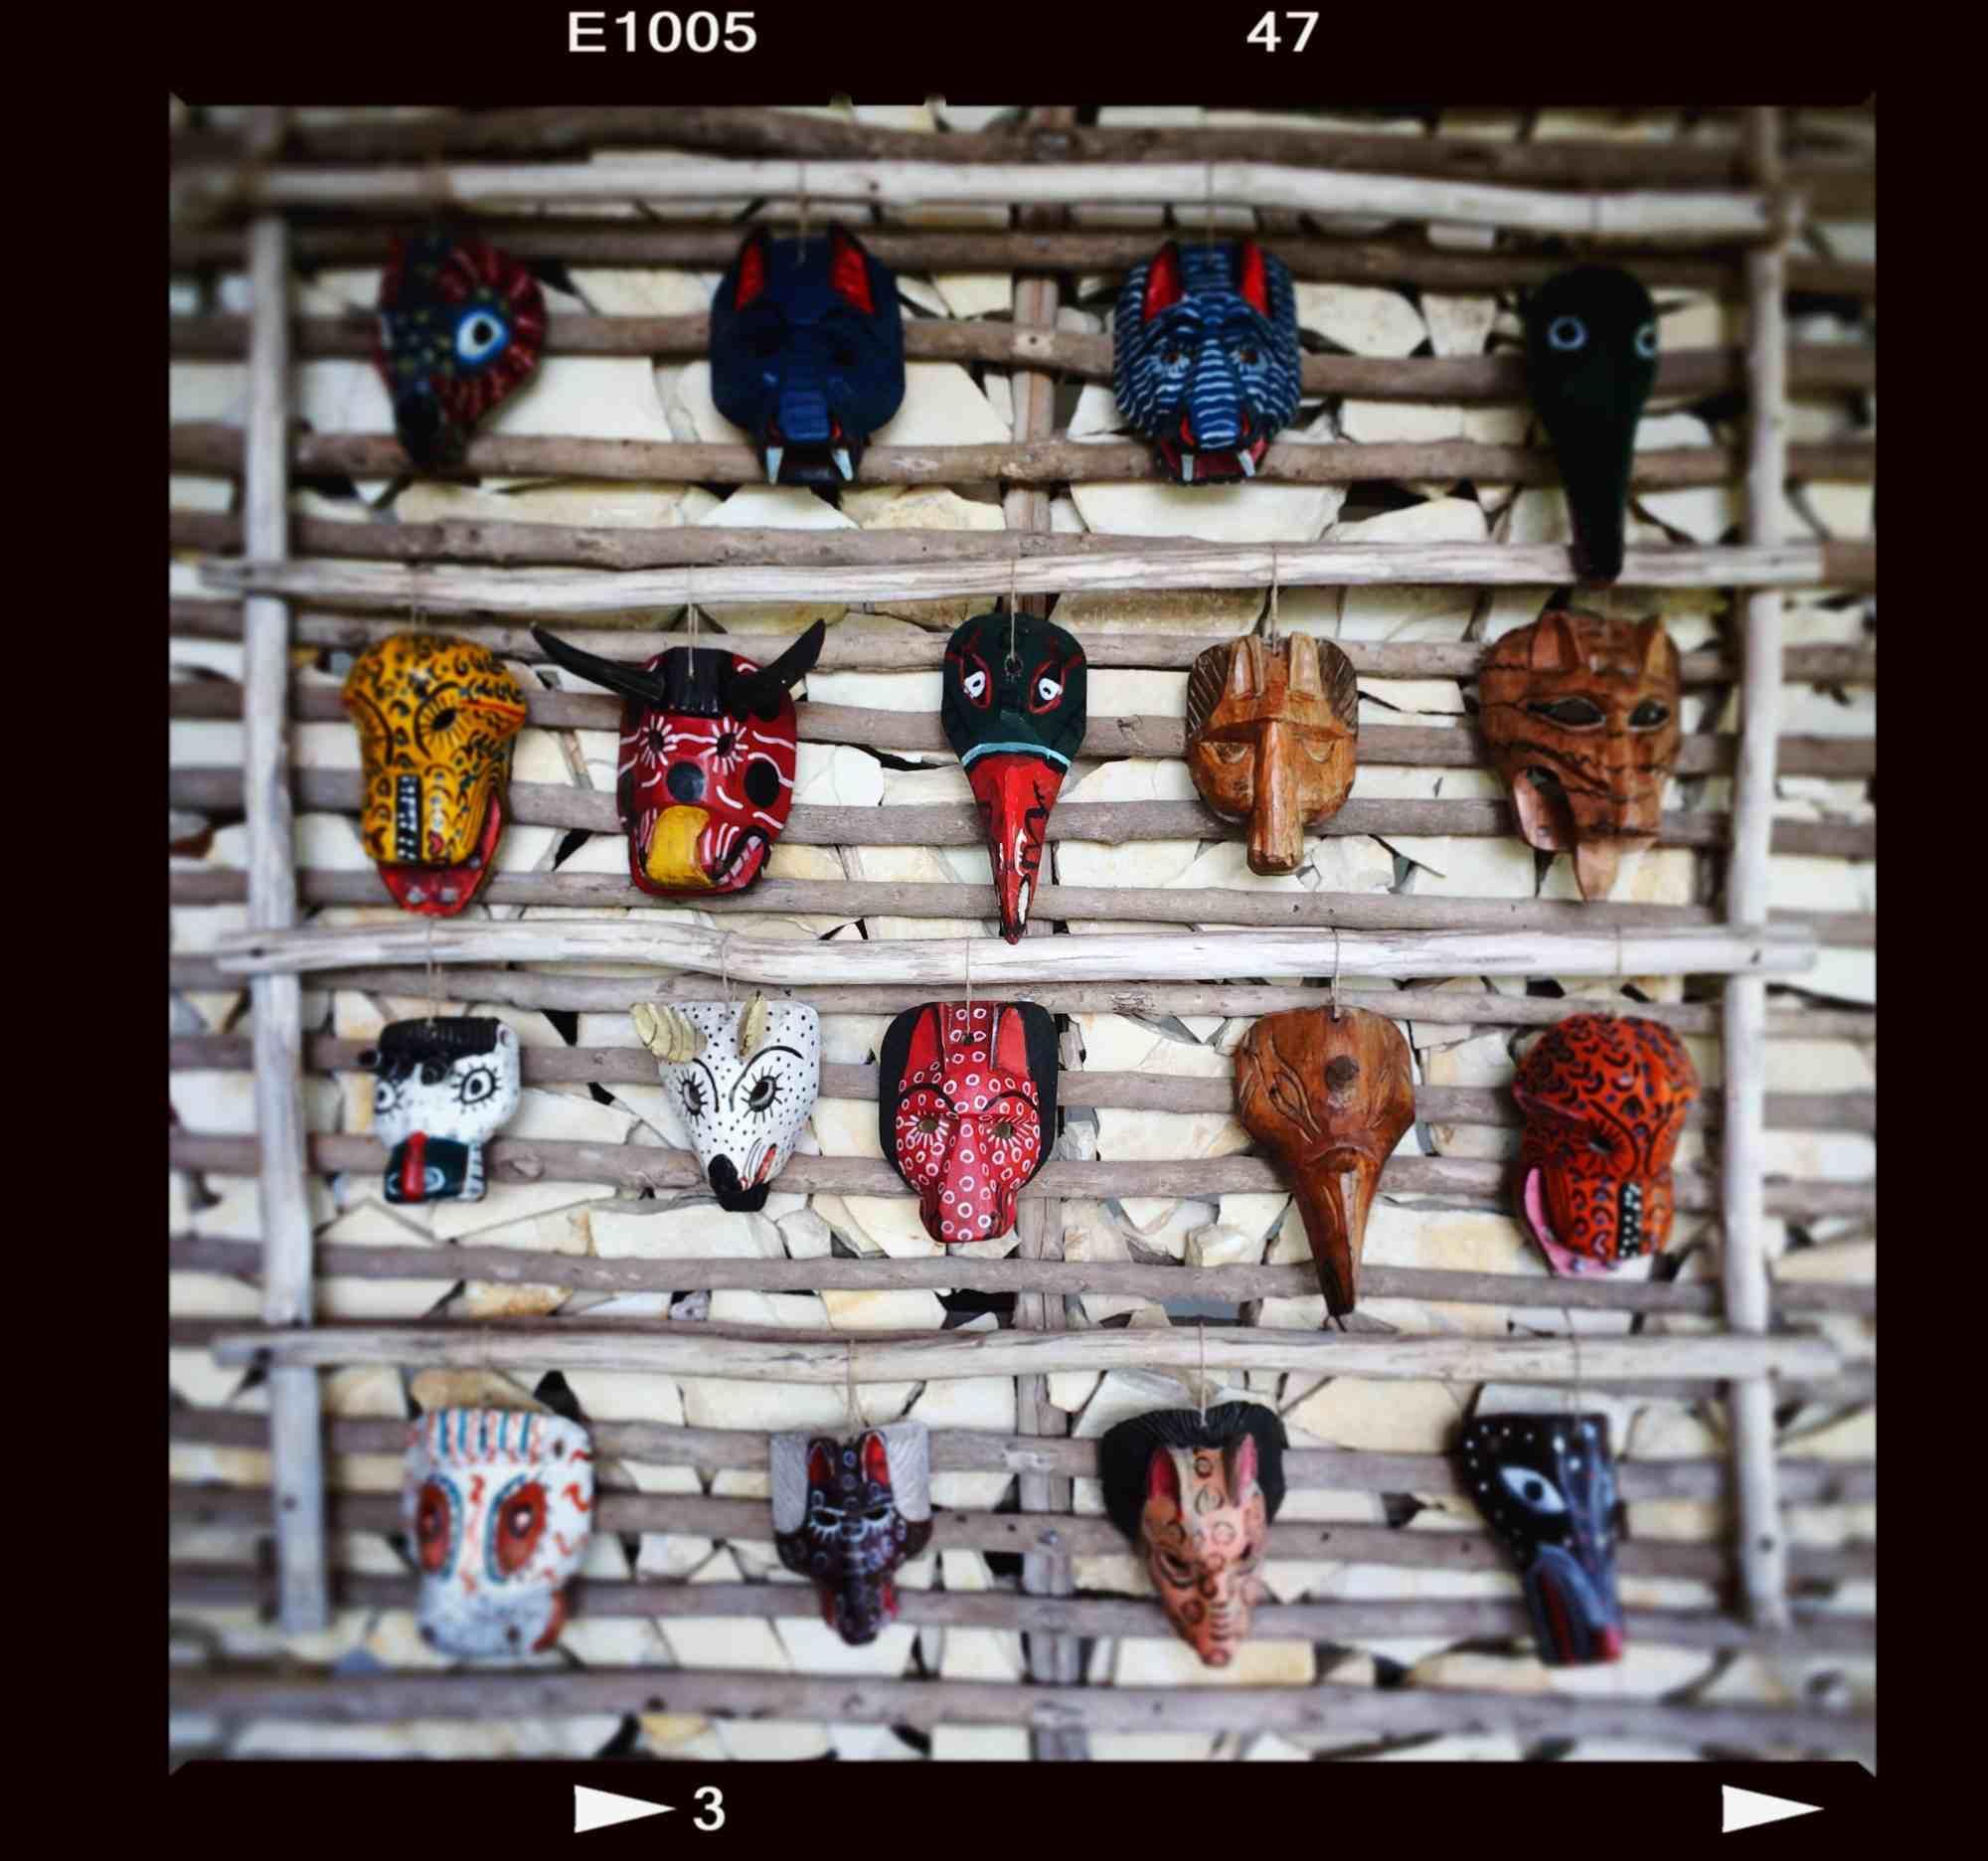 Colorful masks greet visitors at Coppola's La Lancha Resort near Flores, Guatemala.  Photos by Michael Mundt